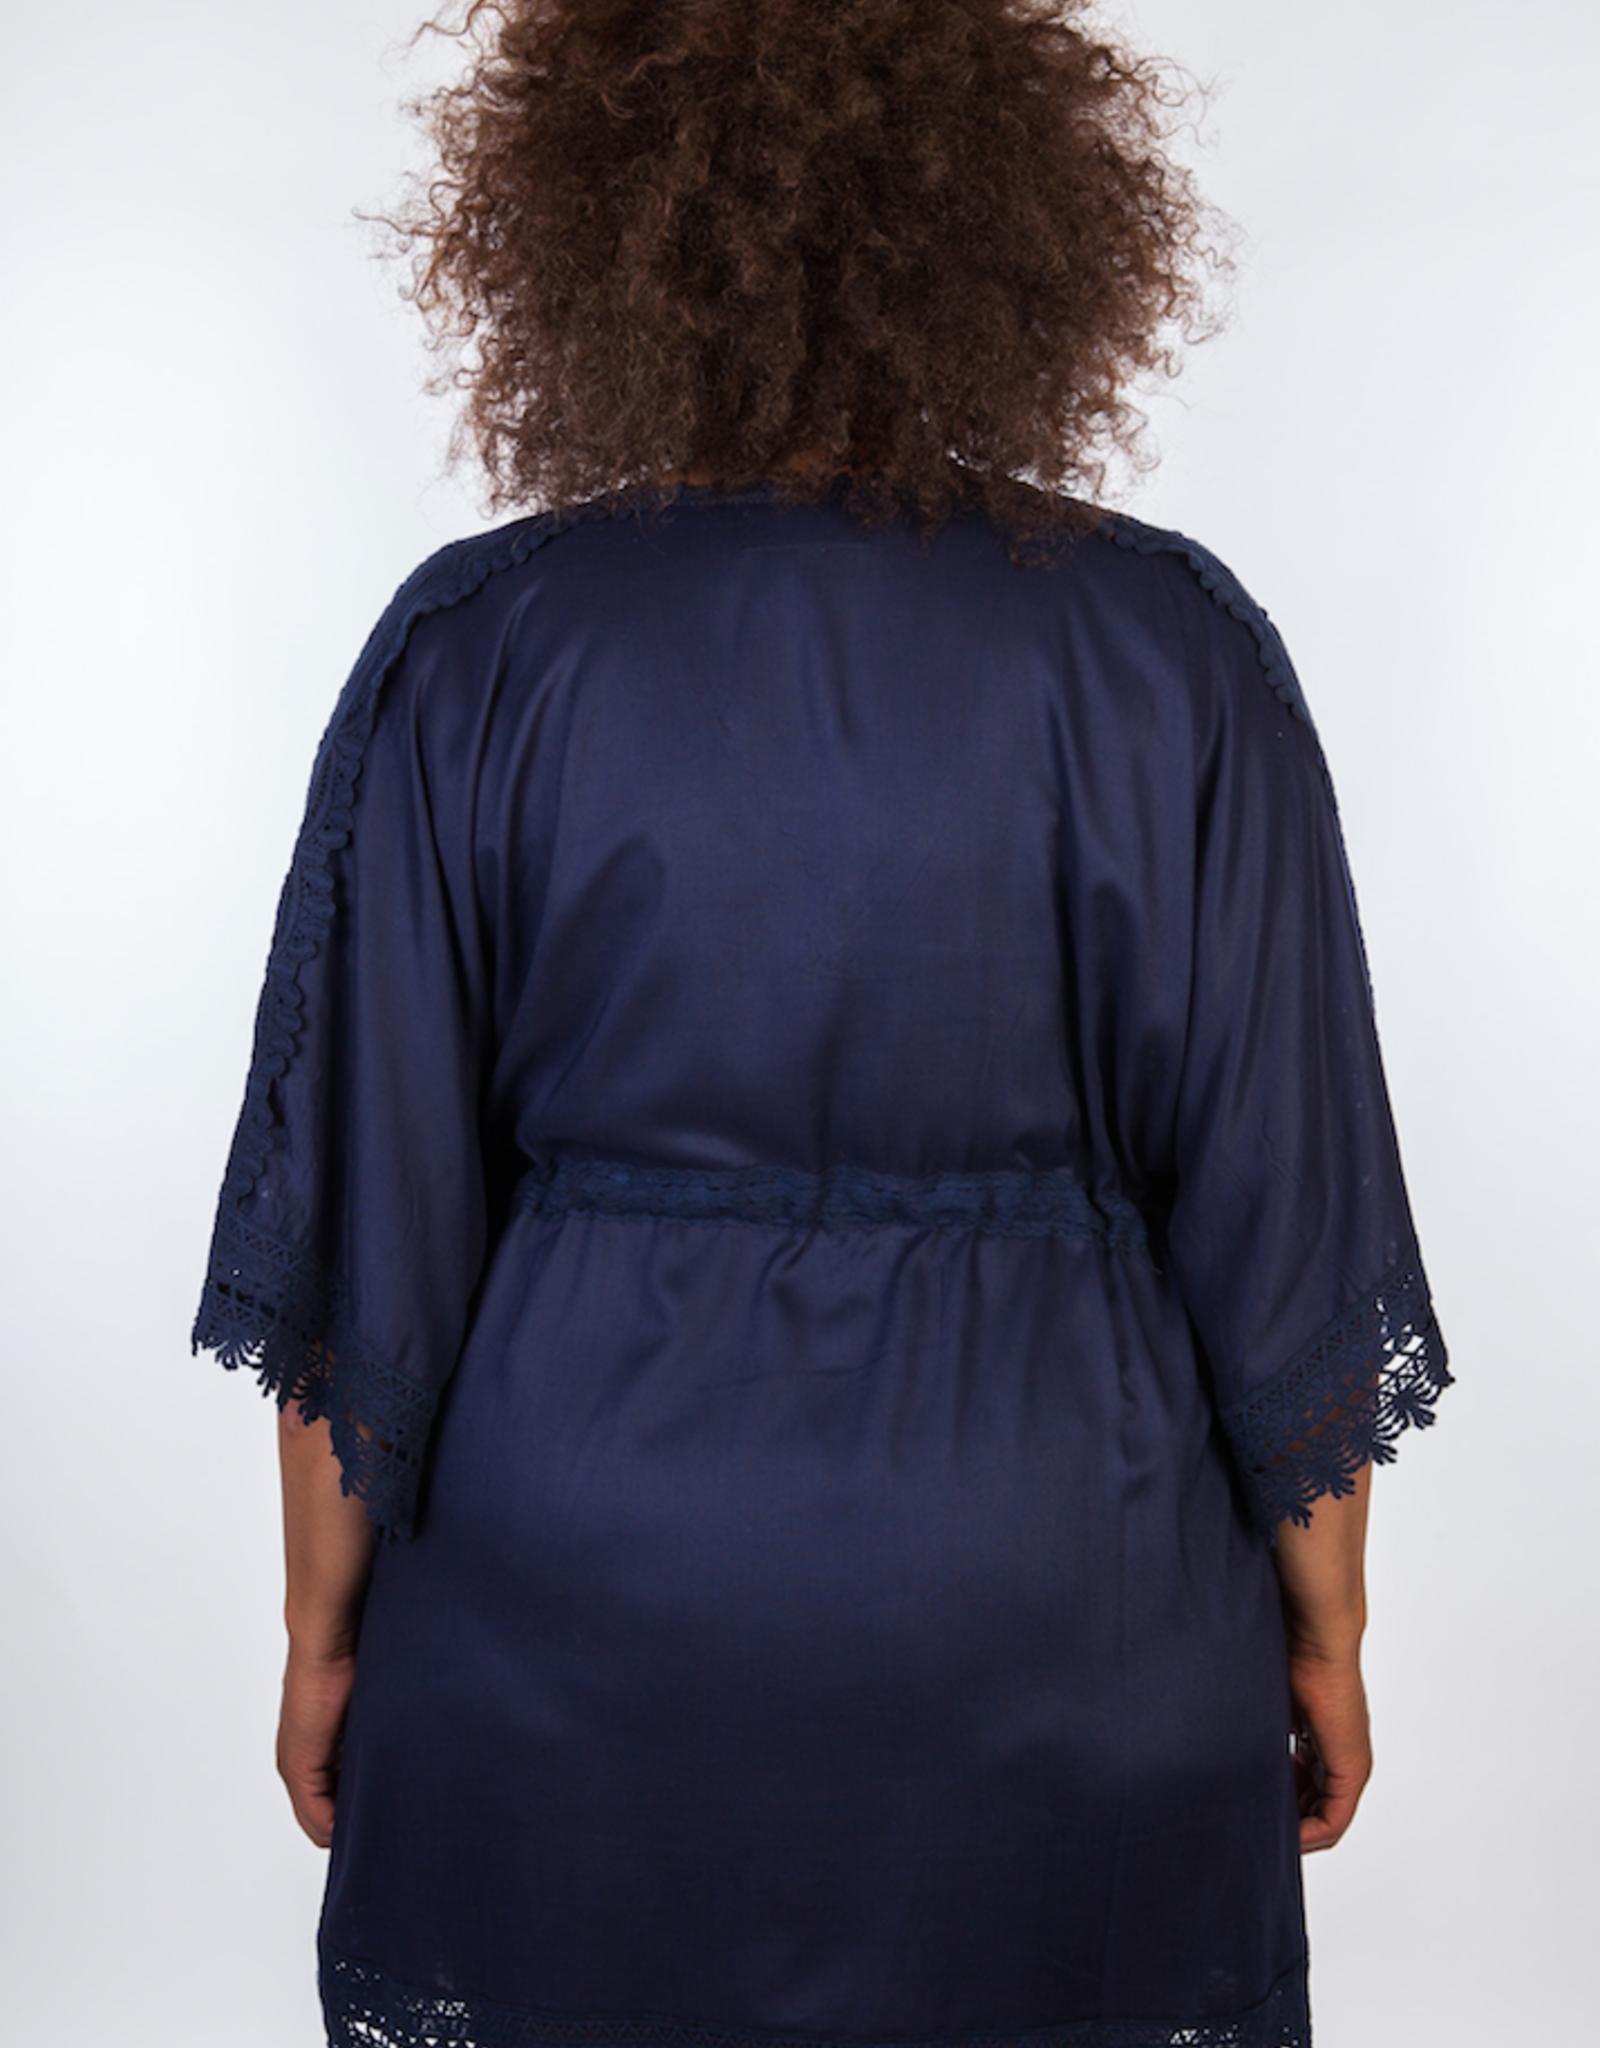 Dresskini Solid Dark Blue Lace